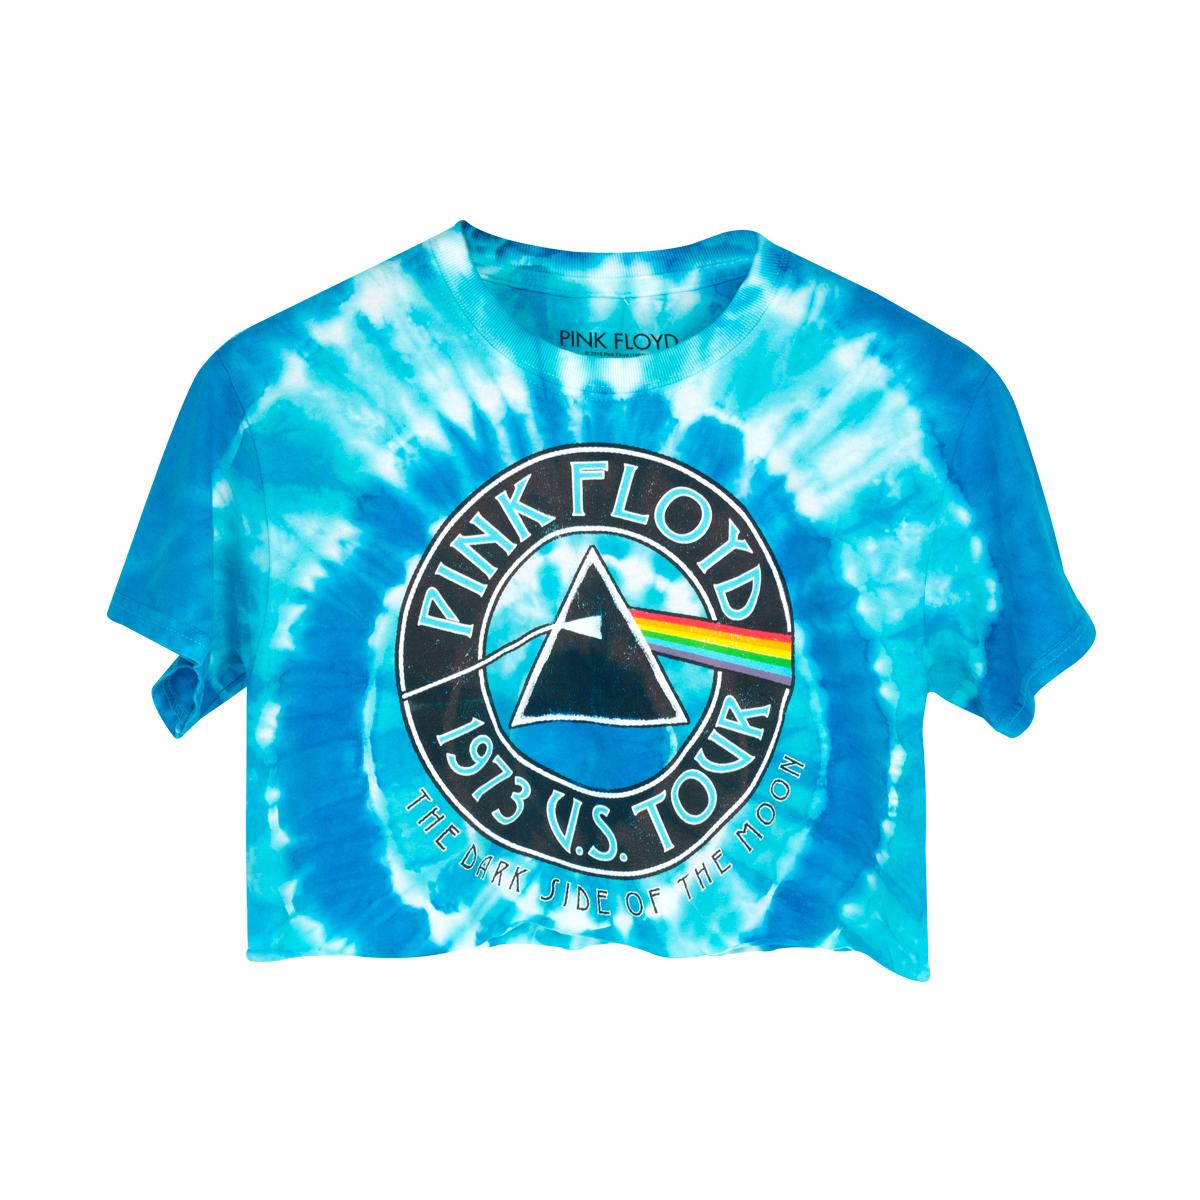 Pink Floyd Blue Girls Tie Dye T-shirt